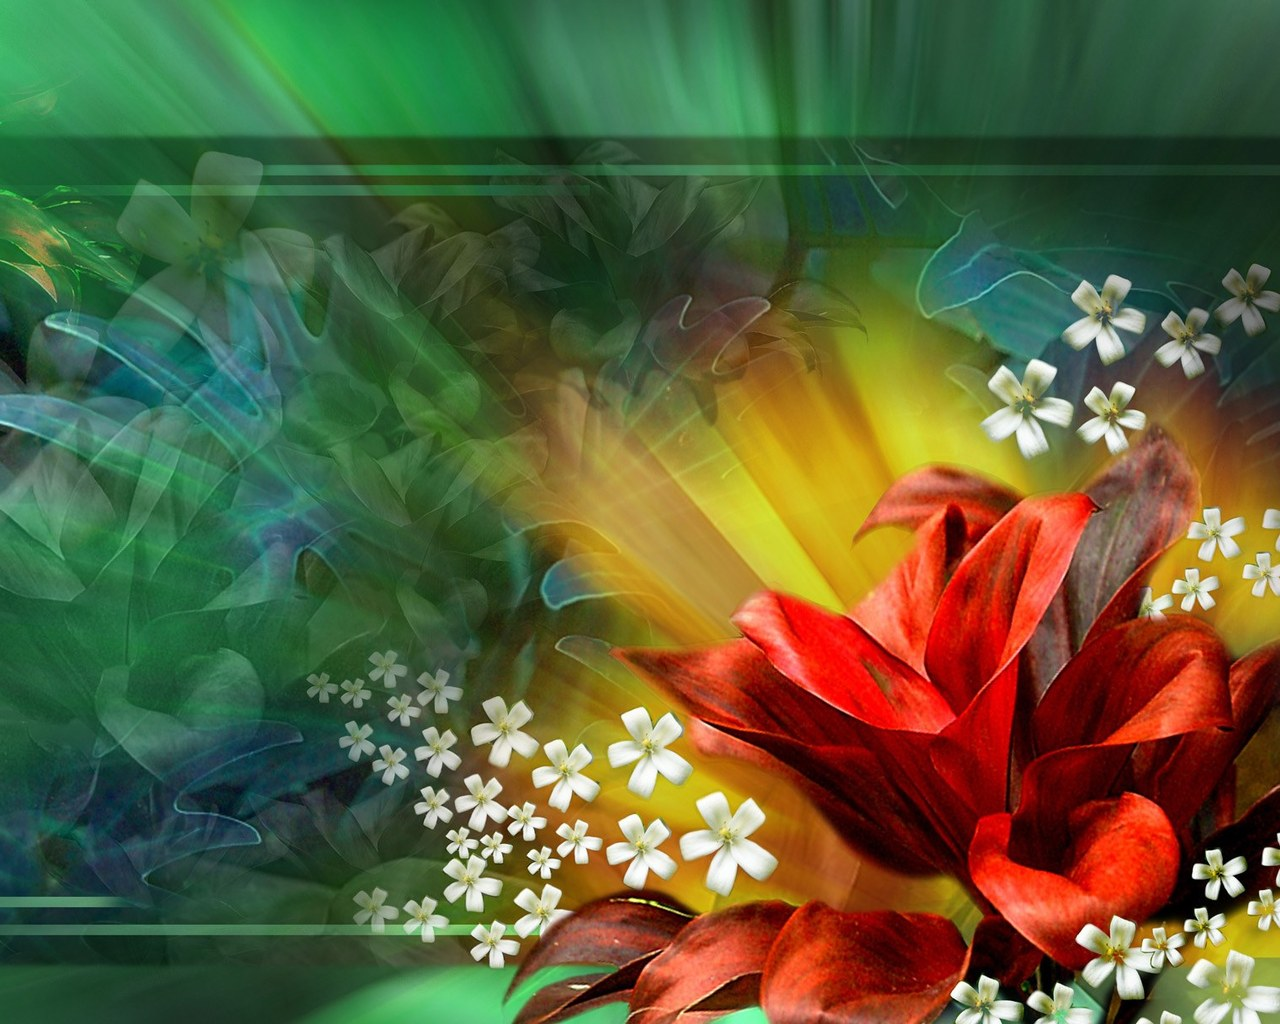 http://4.bp.blogspot.com/-LHibN6EUkro/TgrLbJfe9lI/AAAAAAAAAwU/S5g6F87Eu2Y/s1600/free+animated+desktop+wallpaper.jpg